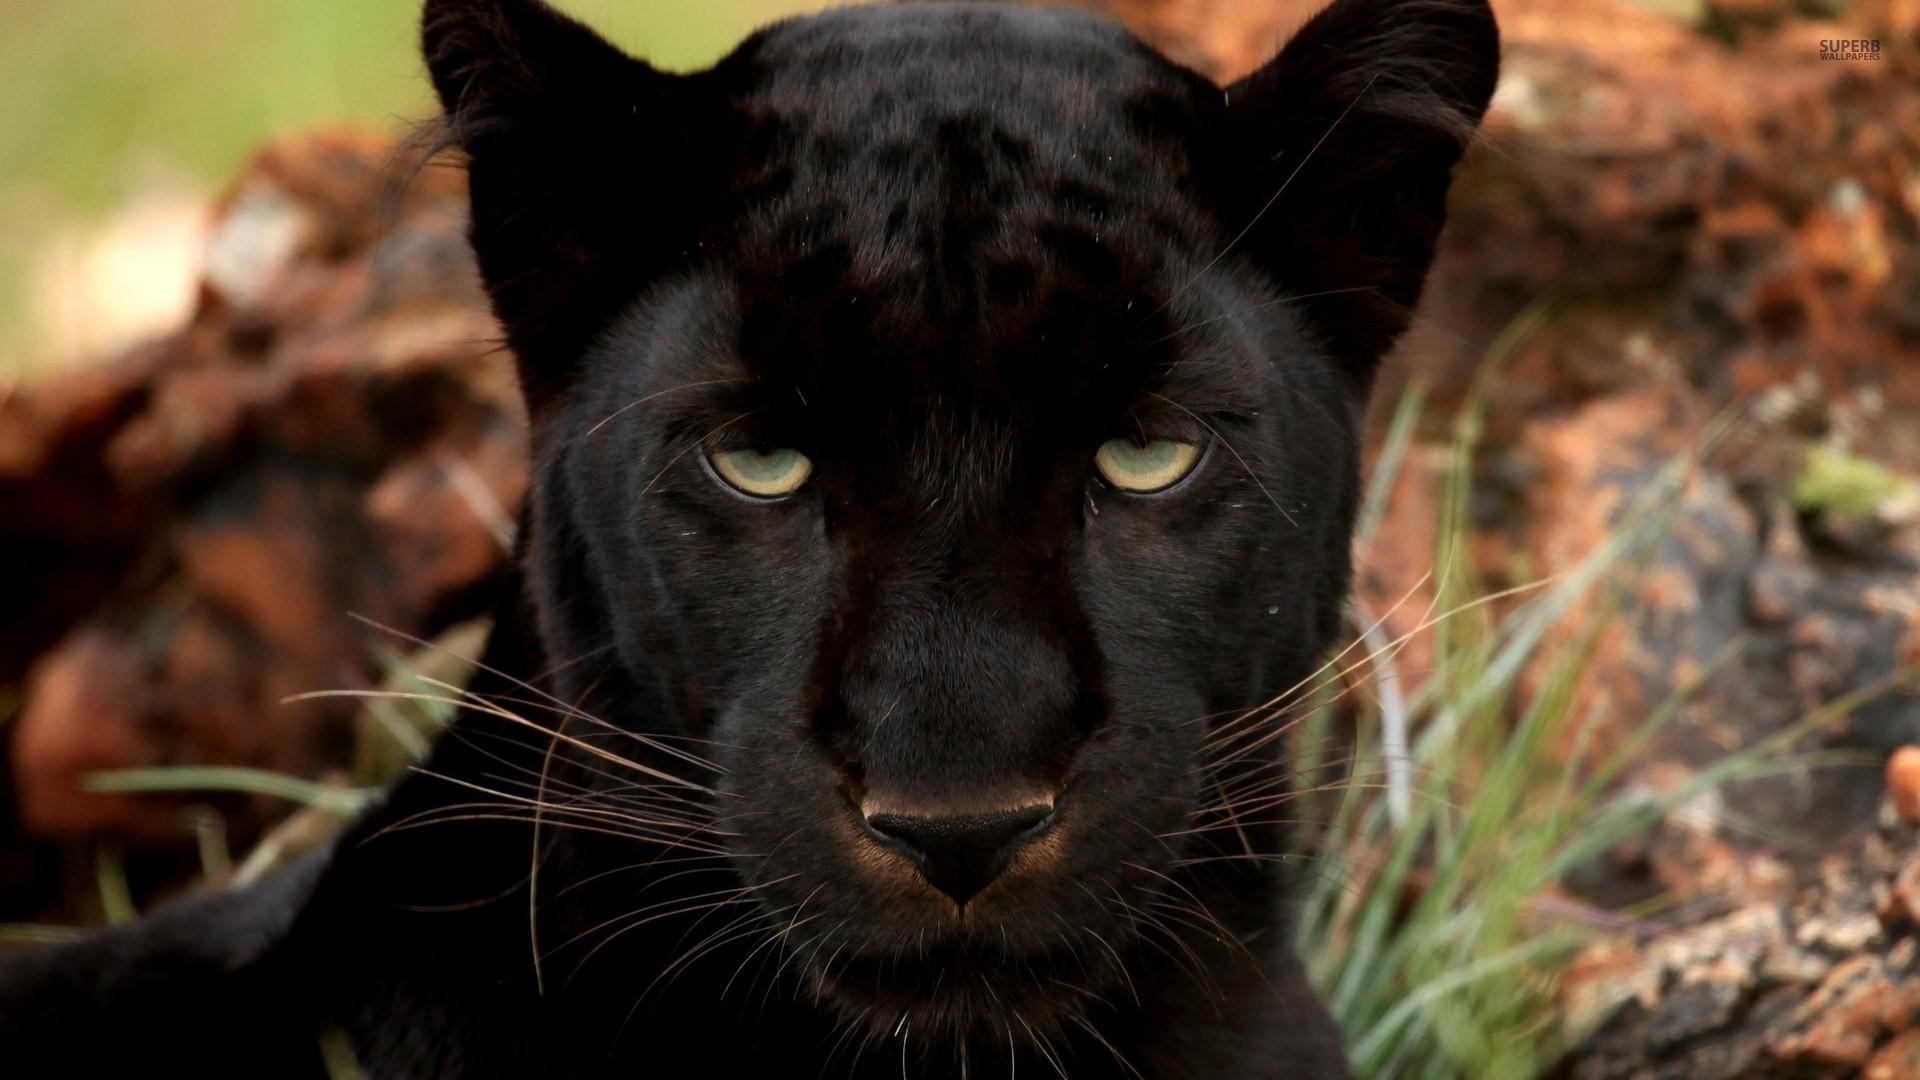 http://cegroni.com/data/uploads/6/281199-black-panther.jpg